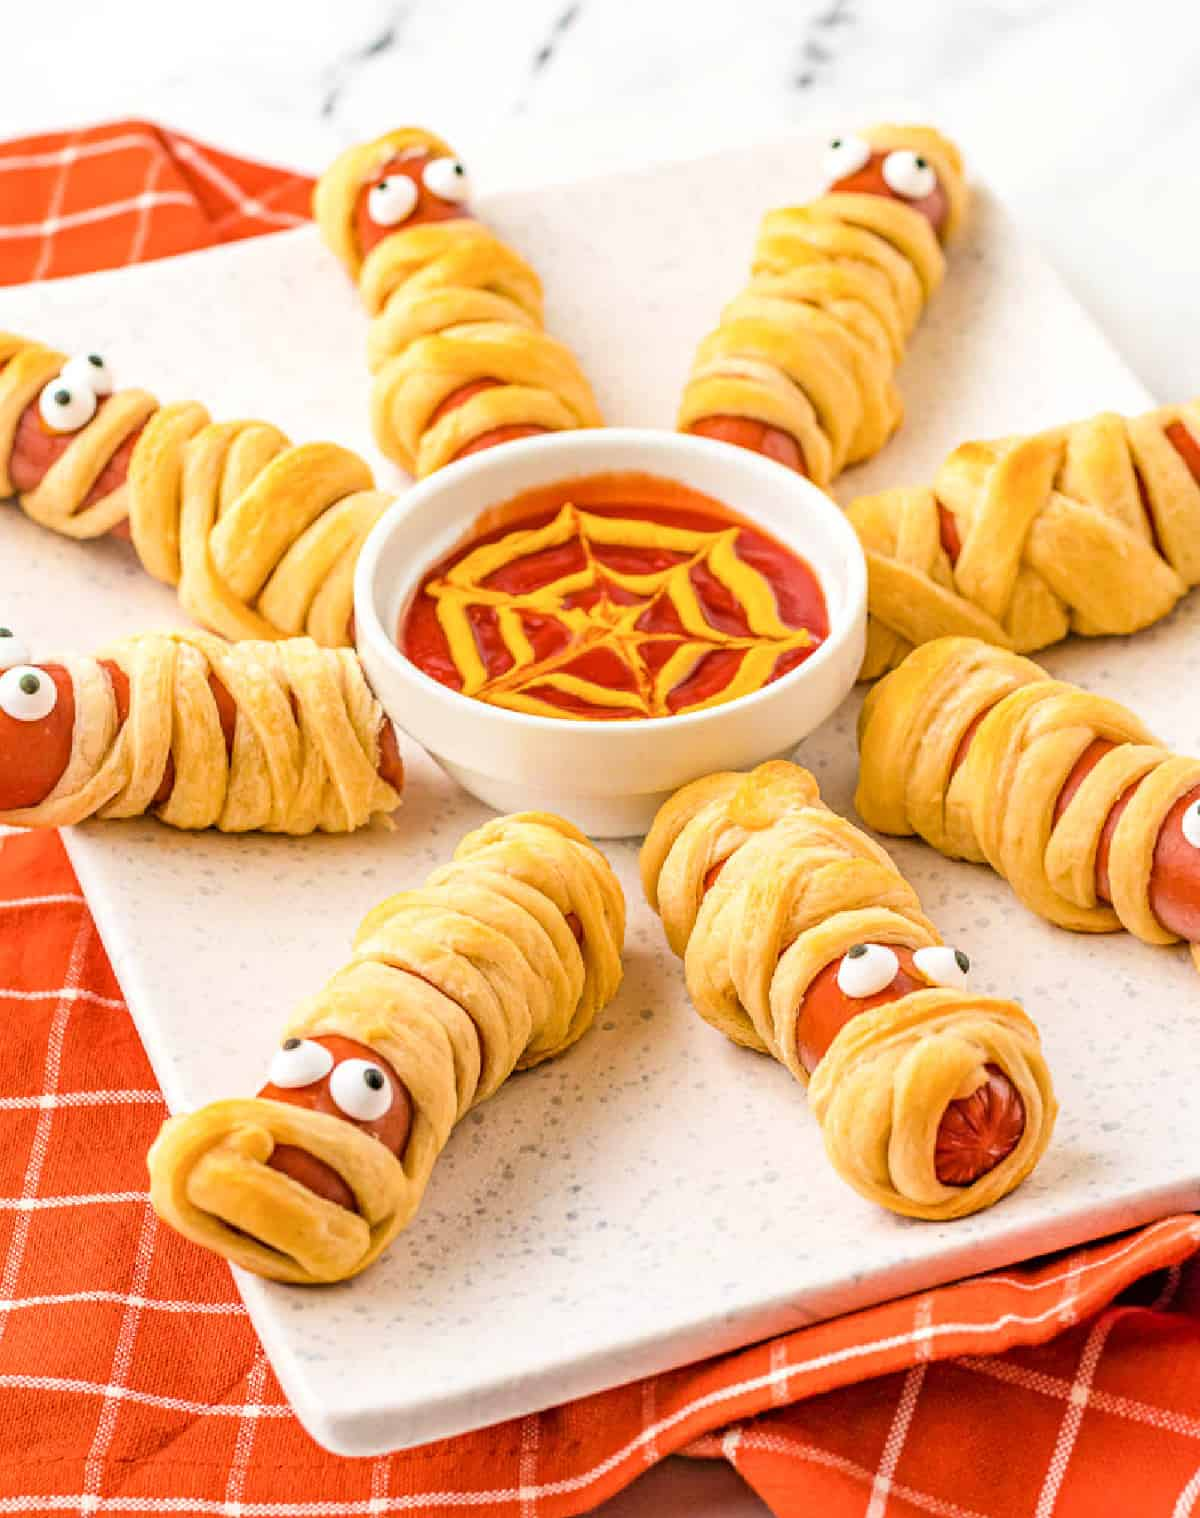 festive mummy hot dogs